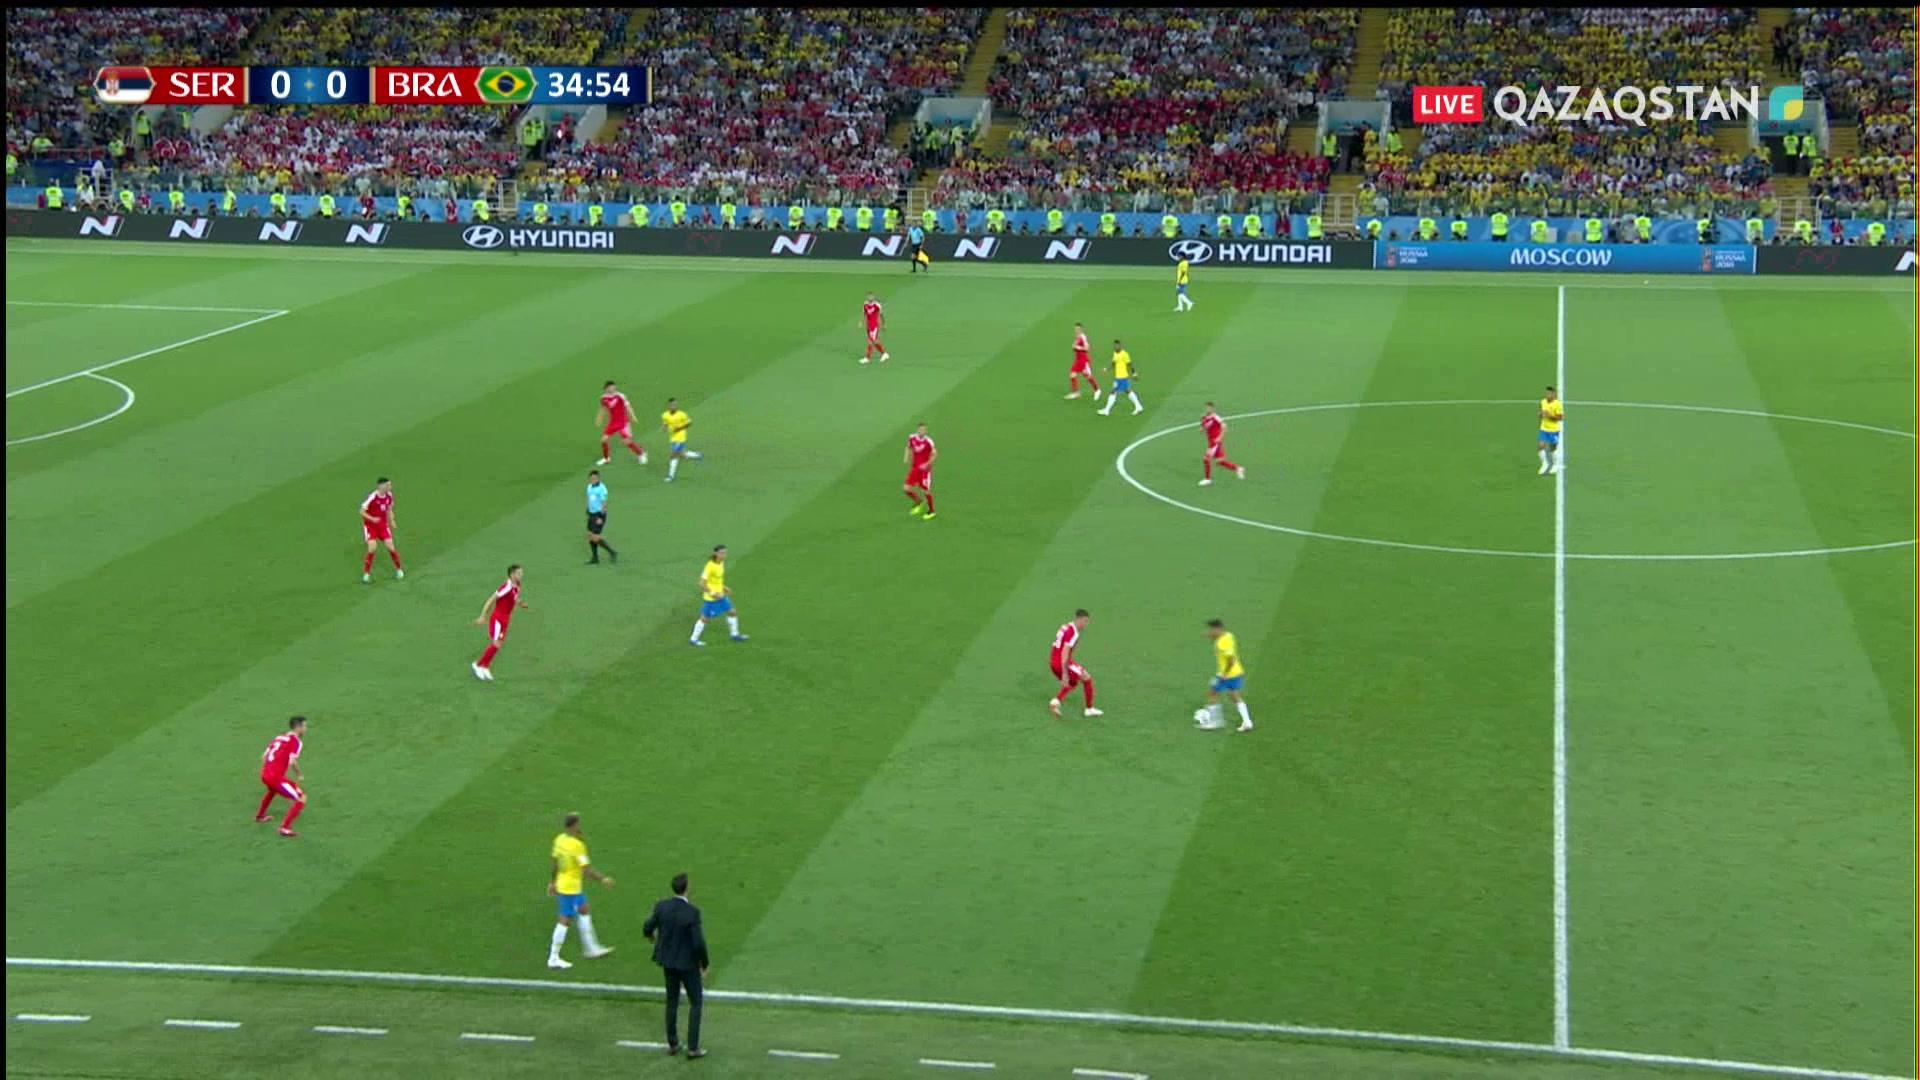 Сербия – Бразилия - 0:1 | Әлем Чемпионаты 2018